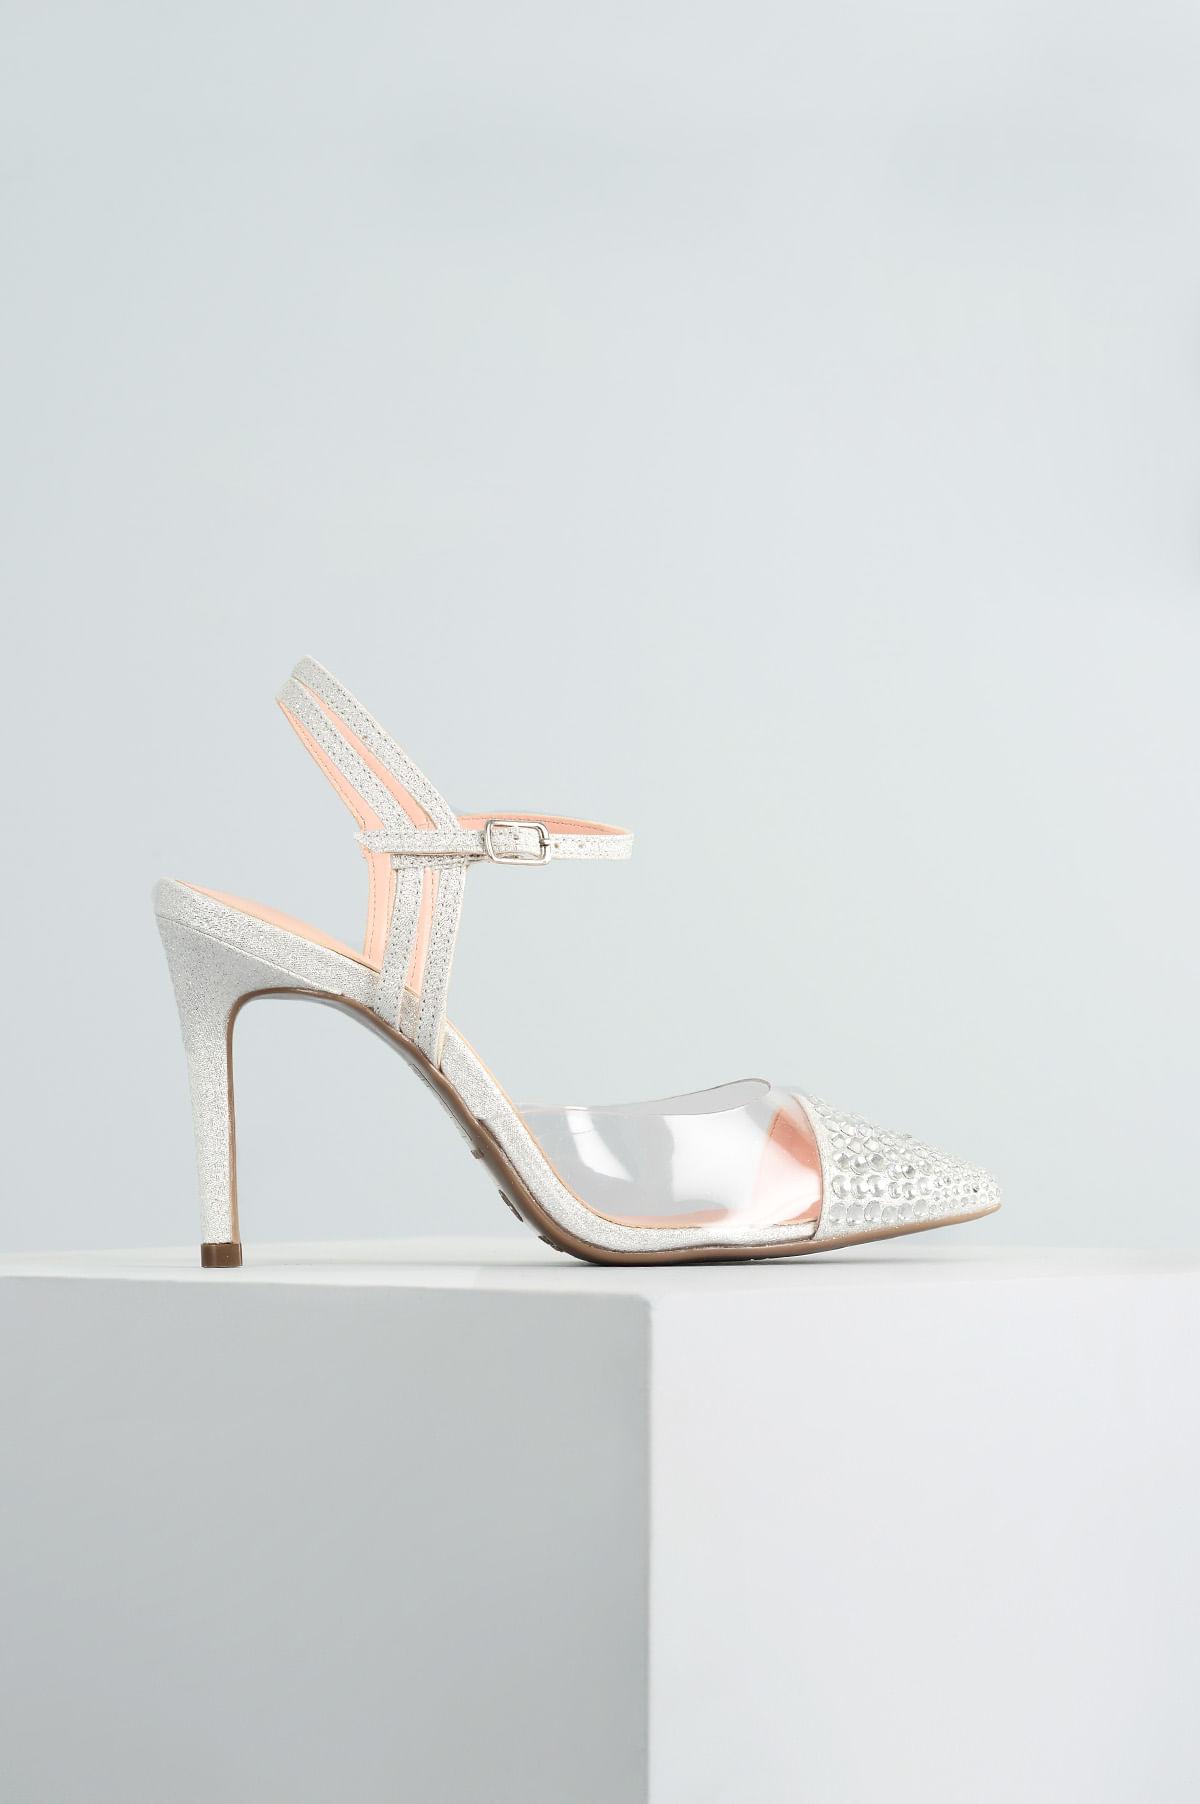 96b2945d44 Sapato Salto Alto Moncey Mundial TEC - PRATA - Mundial Calçados